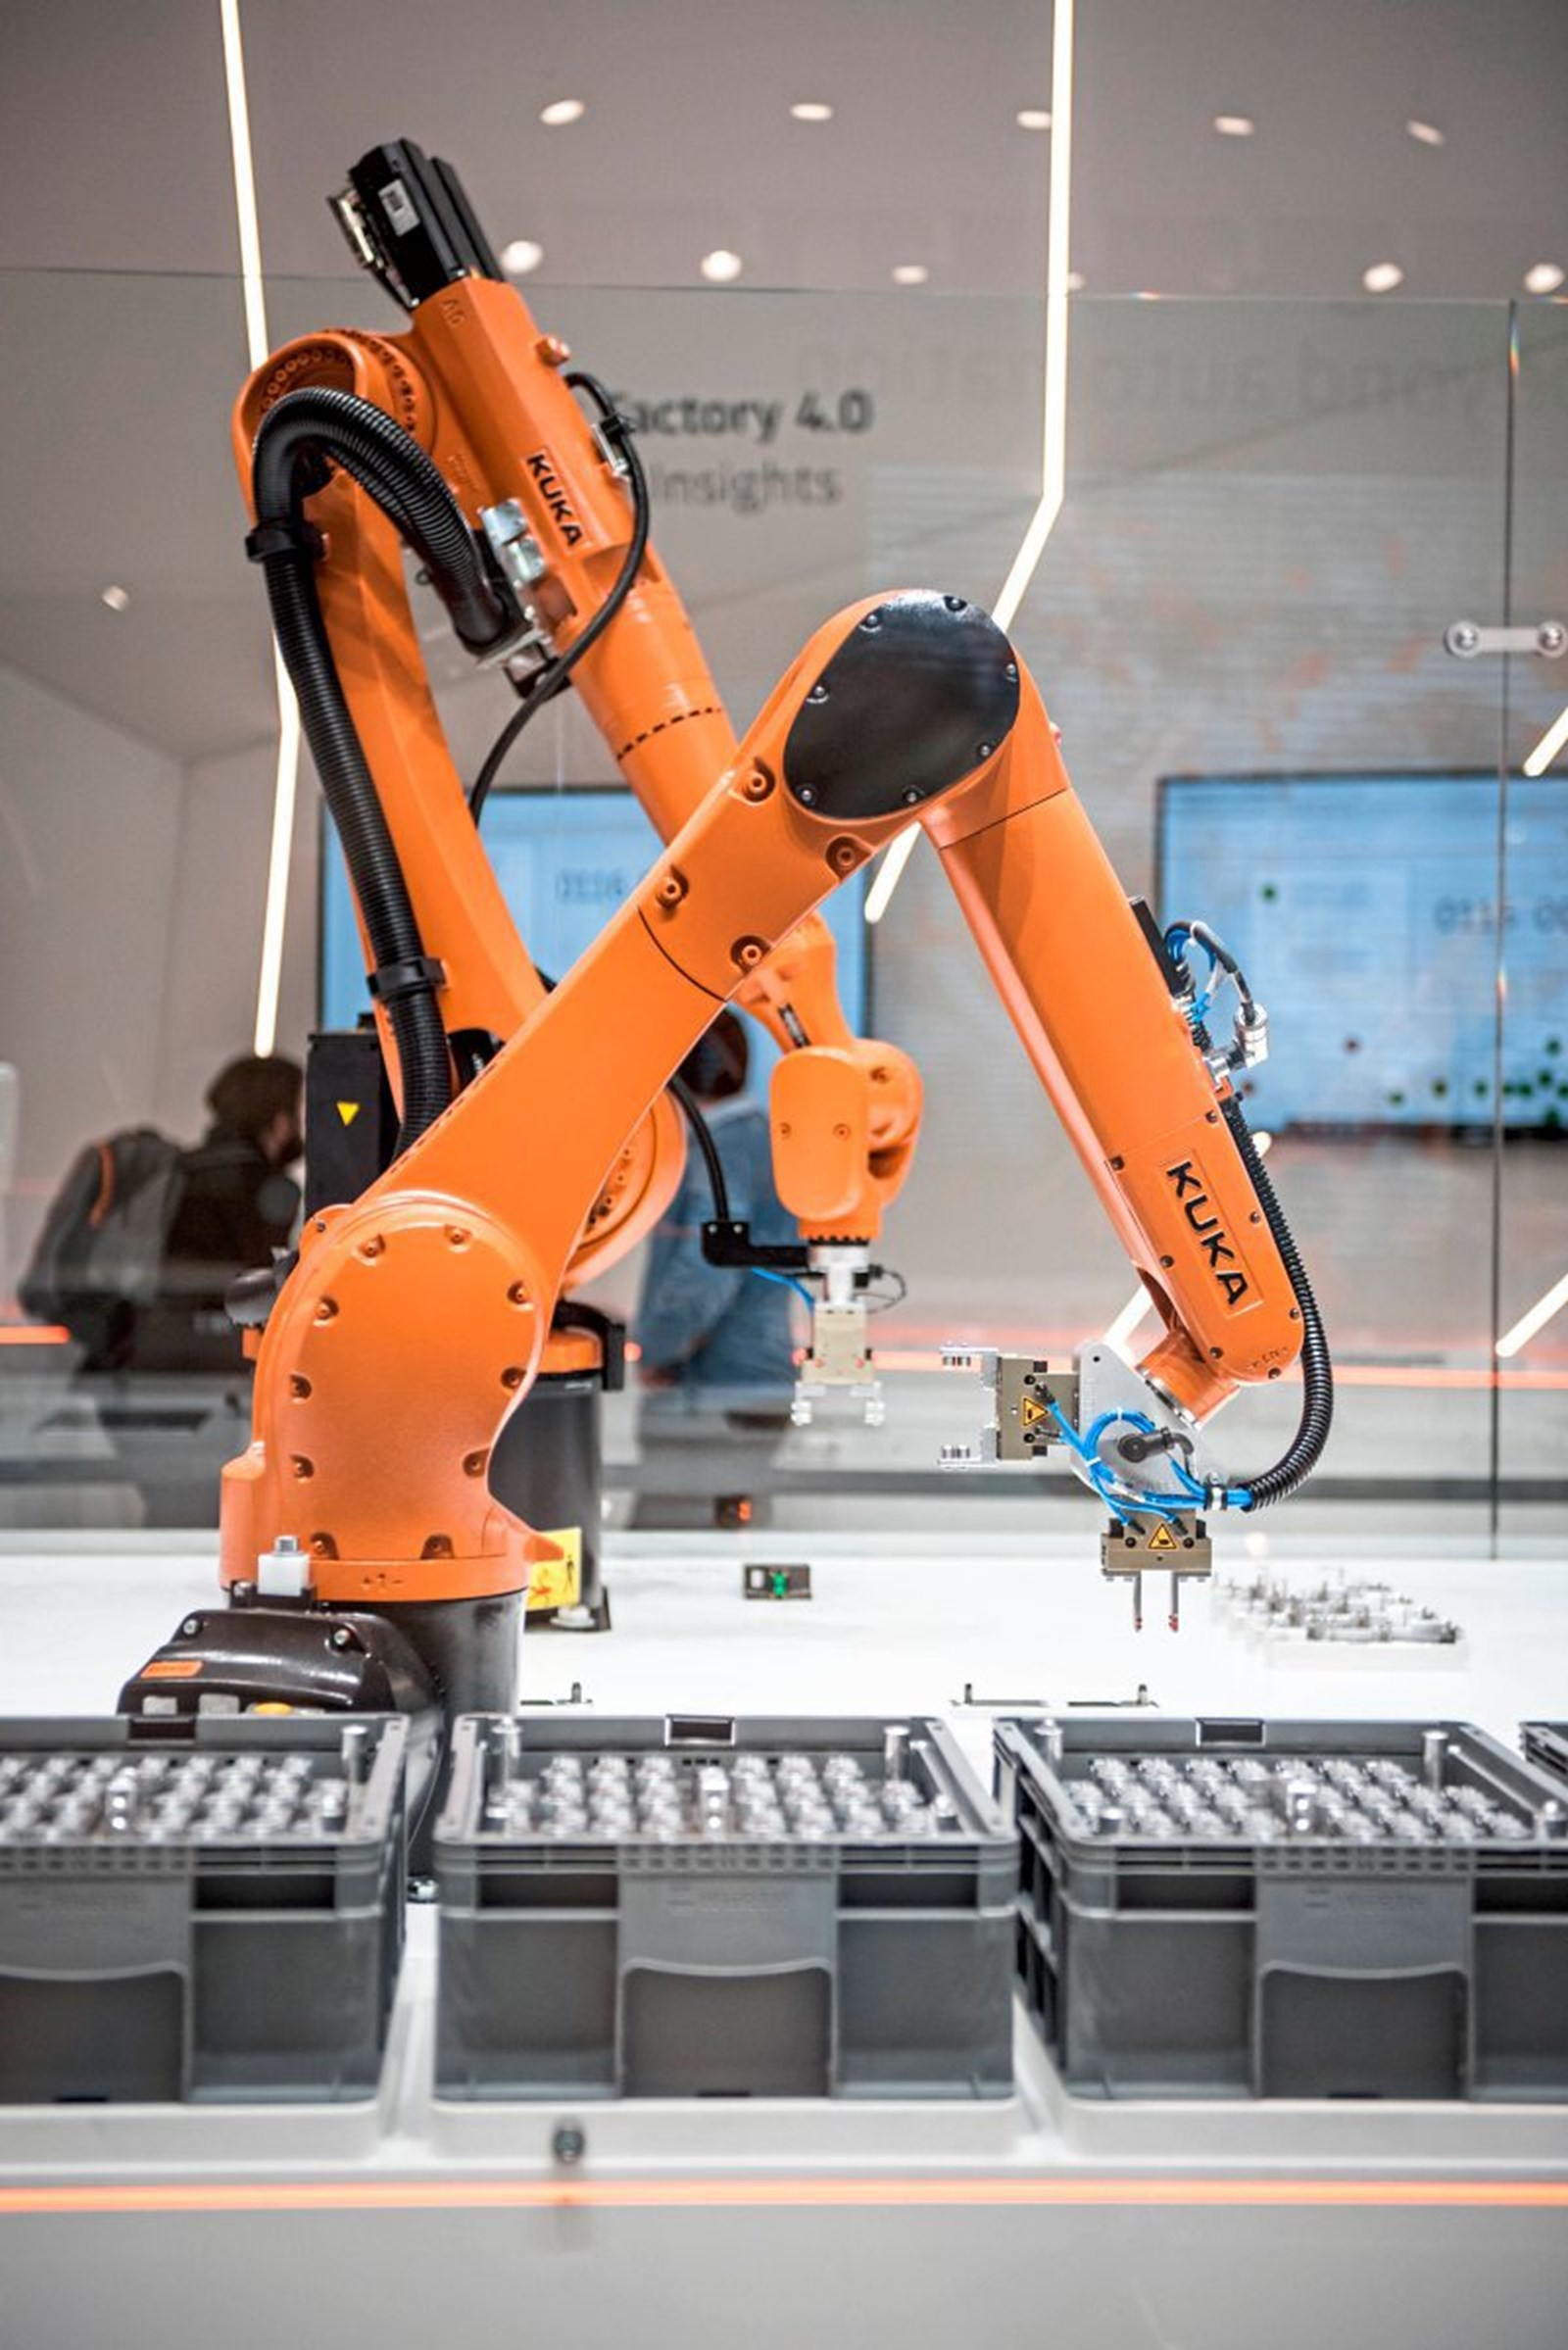 Industrieroboter trifft digitalen Zwilling